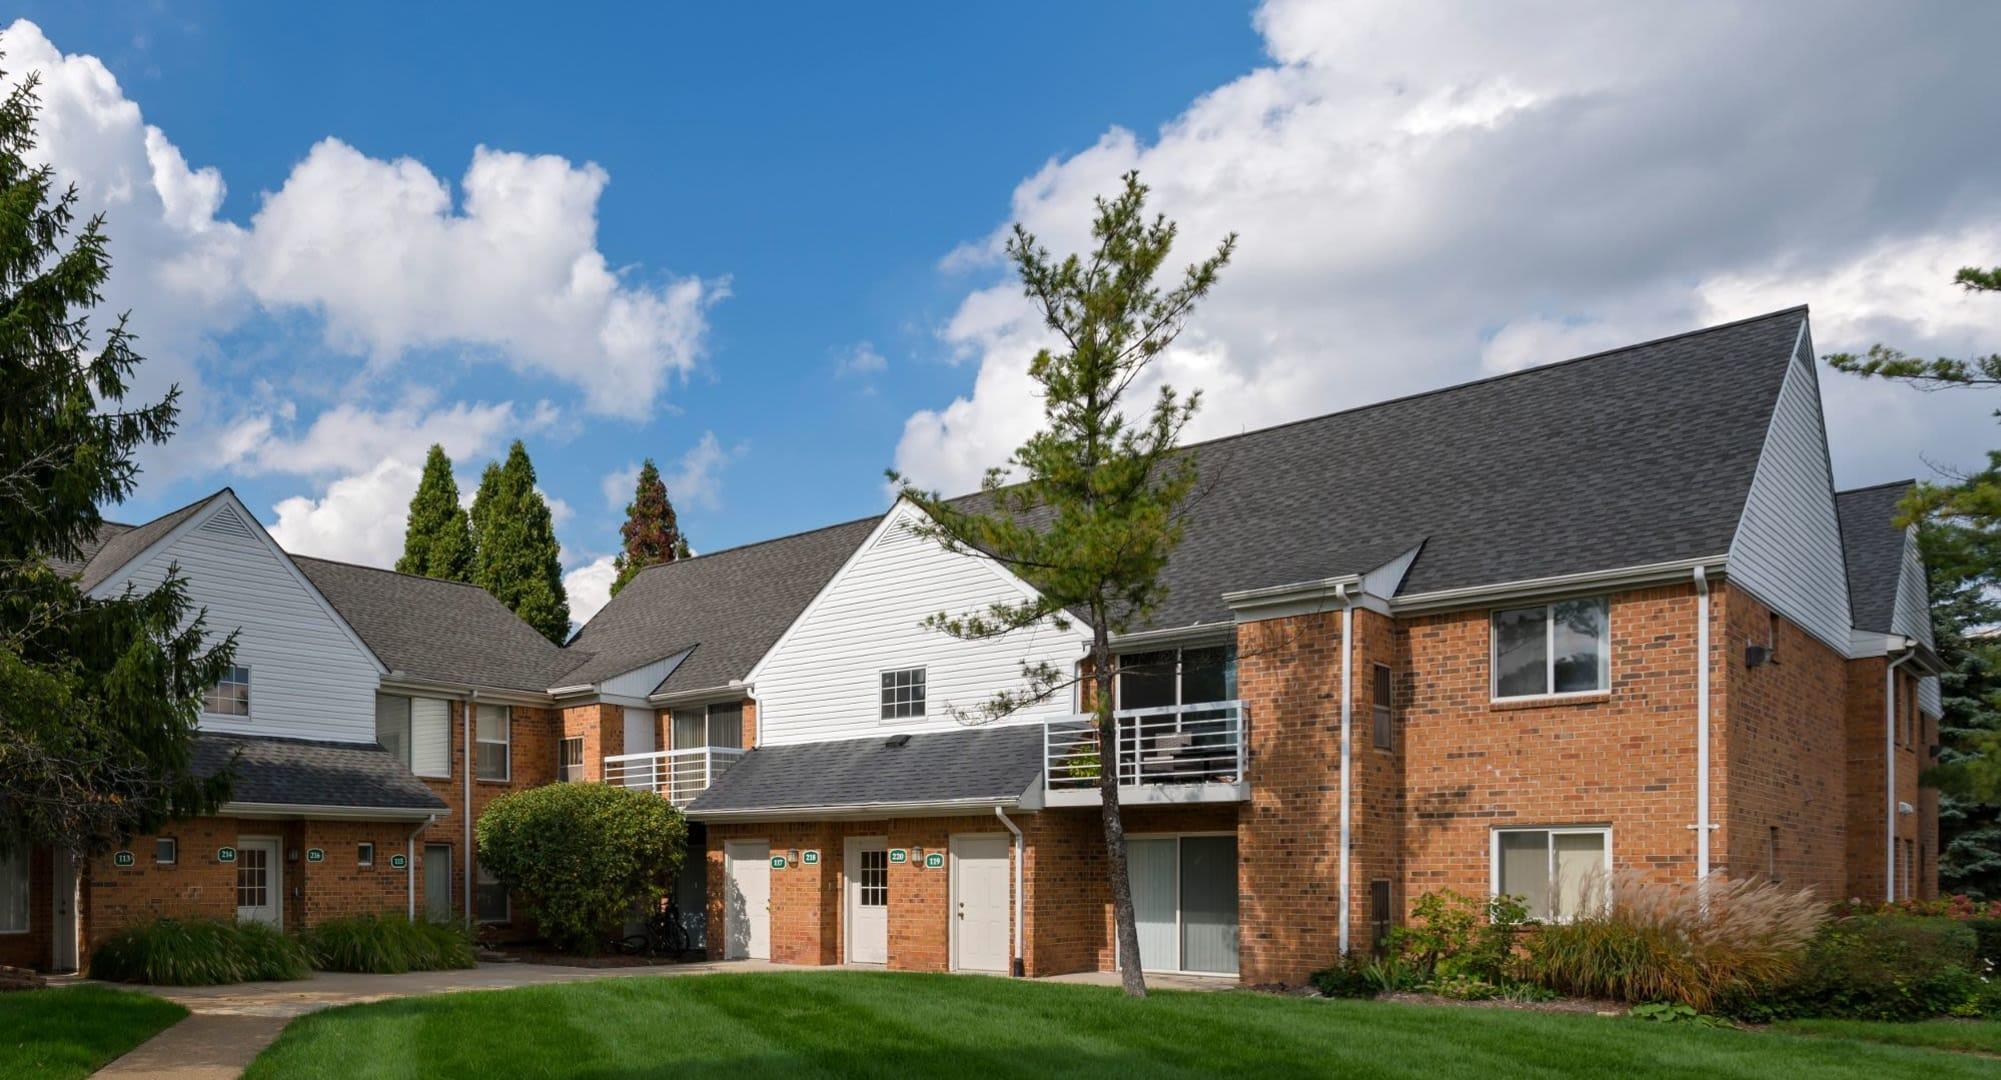 Apartments in Farmington Hills, MI